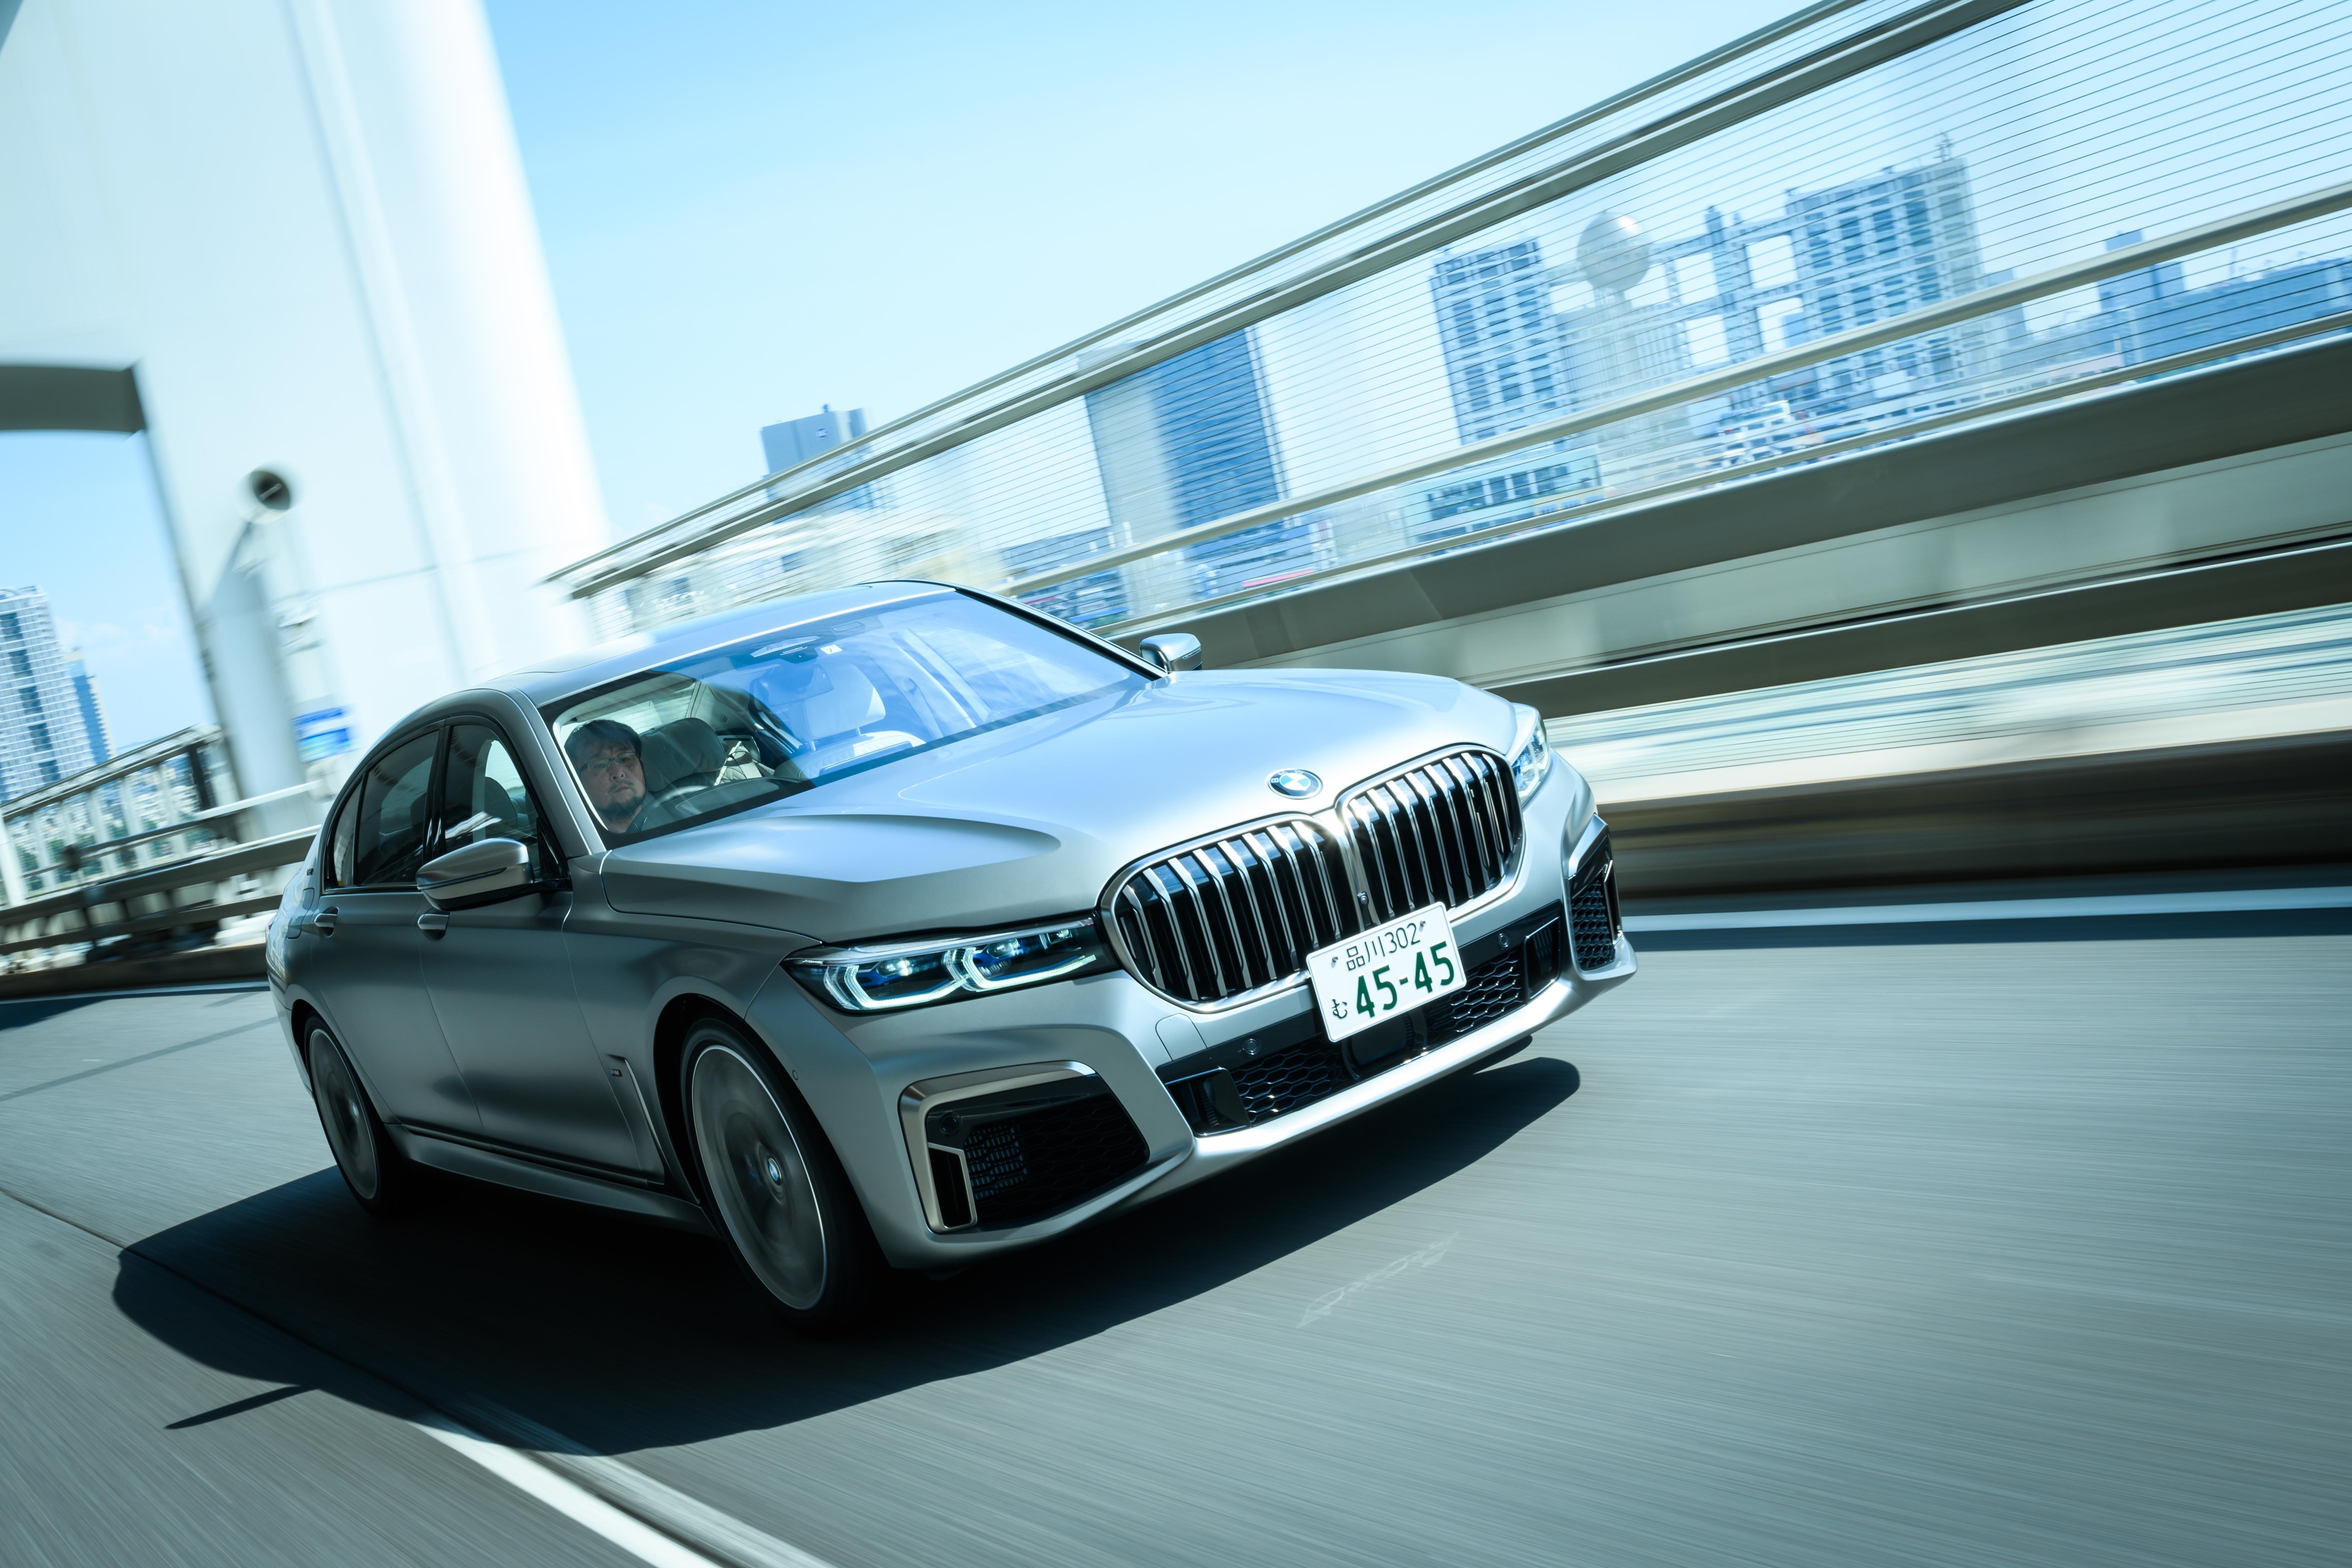 V12の凄みとは? 新型BMW M760Li xDrive試乗記